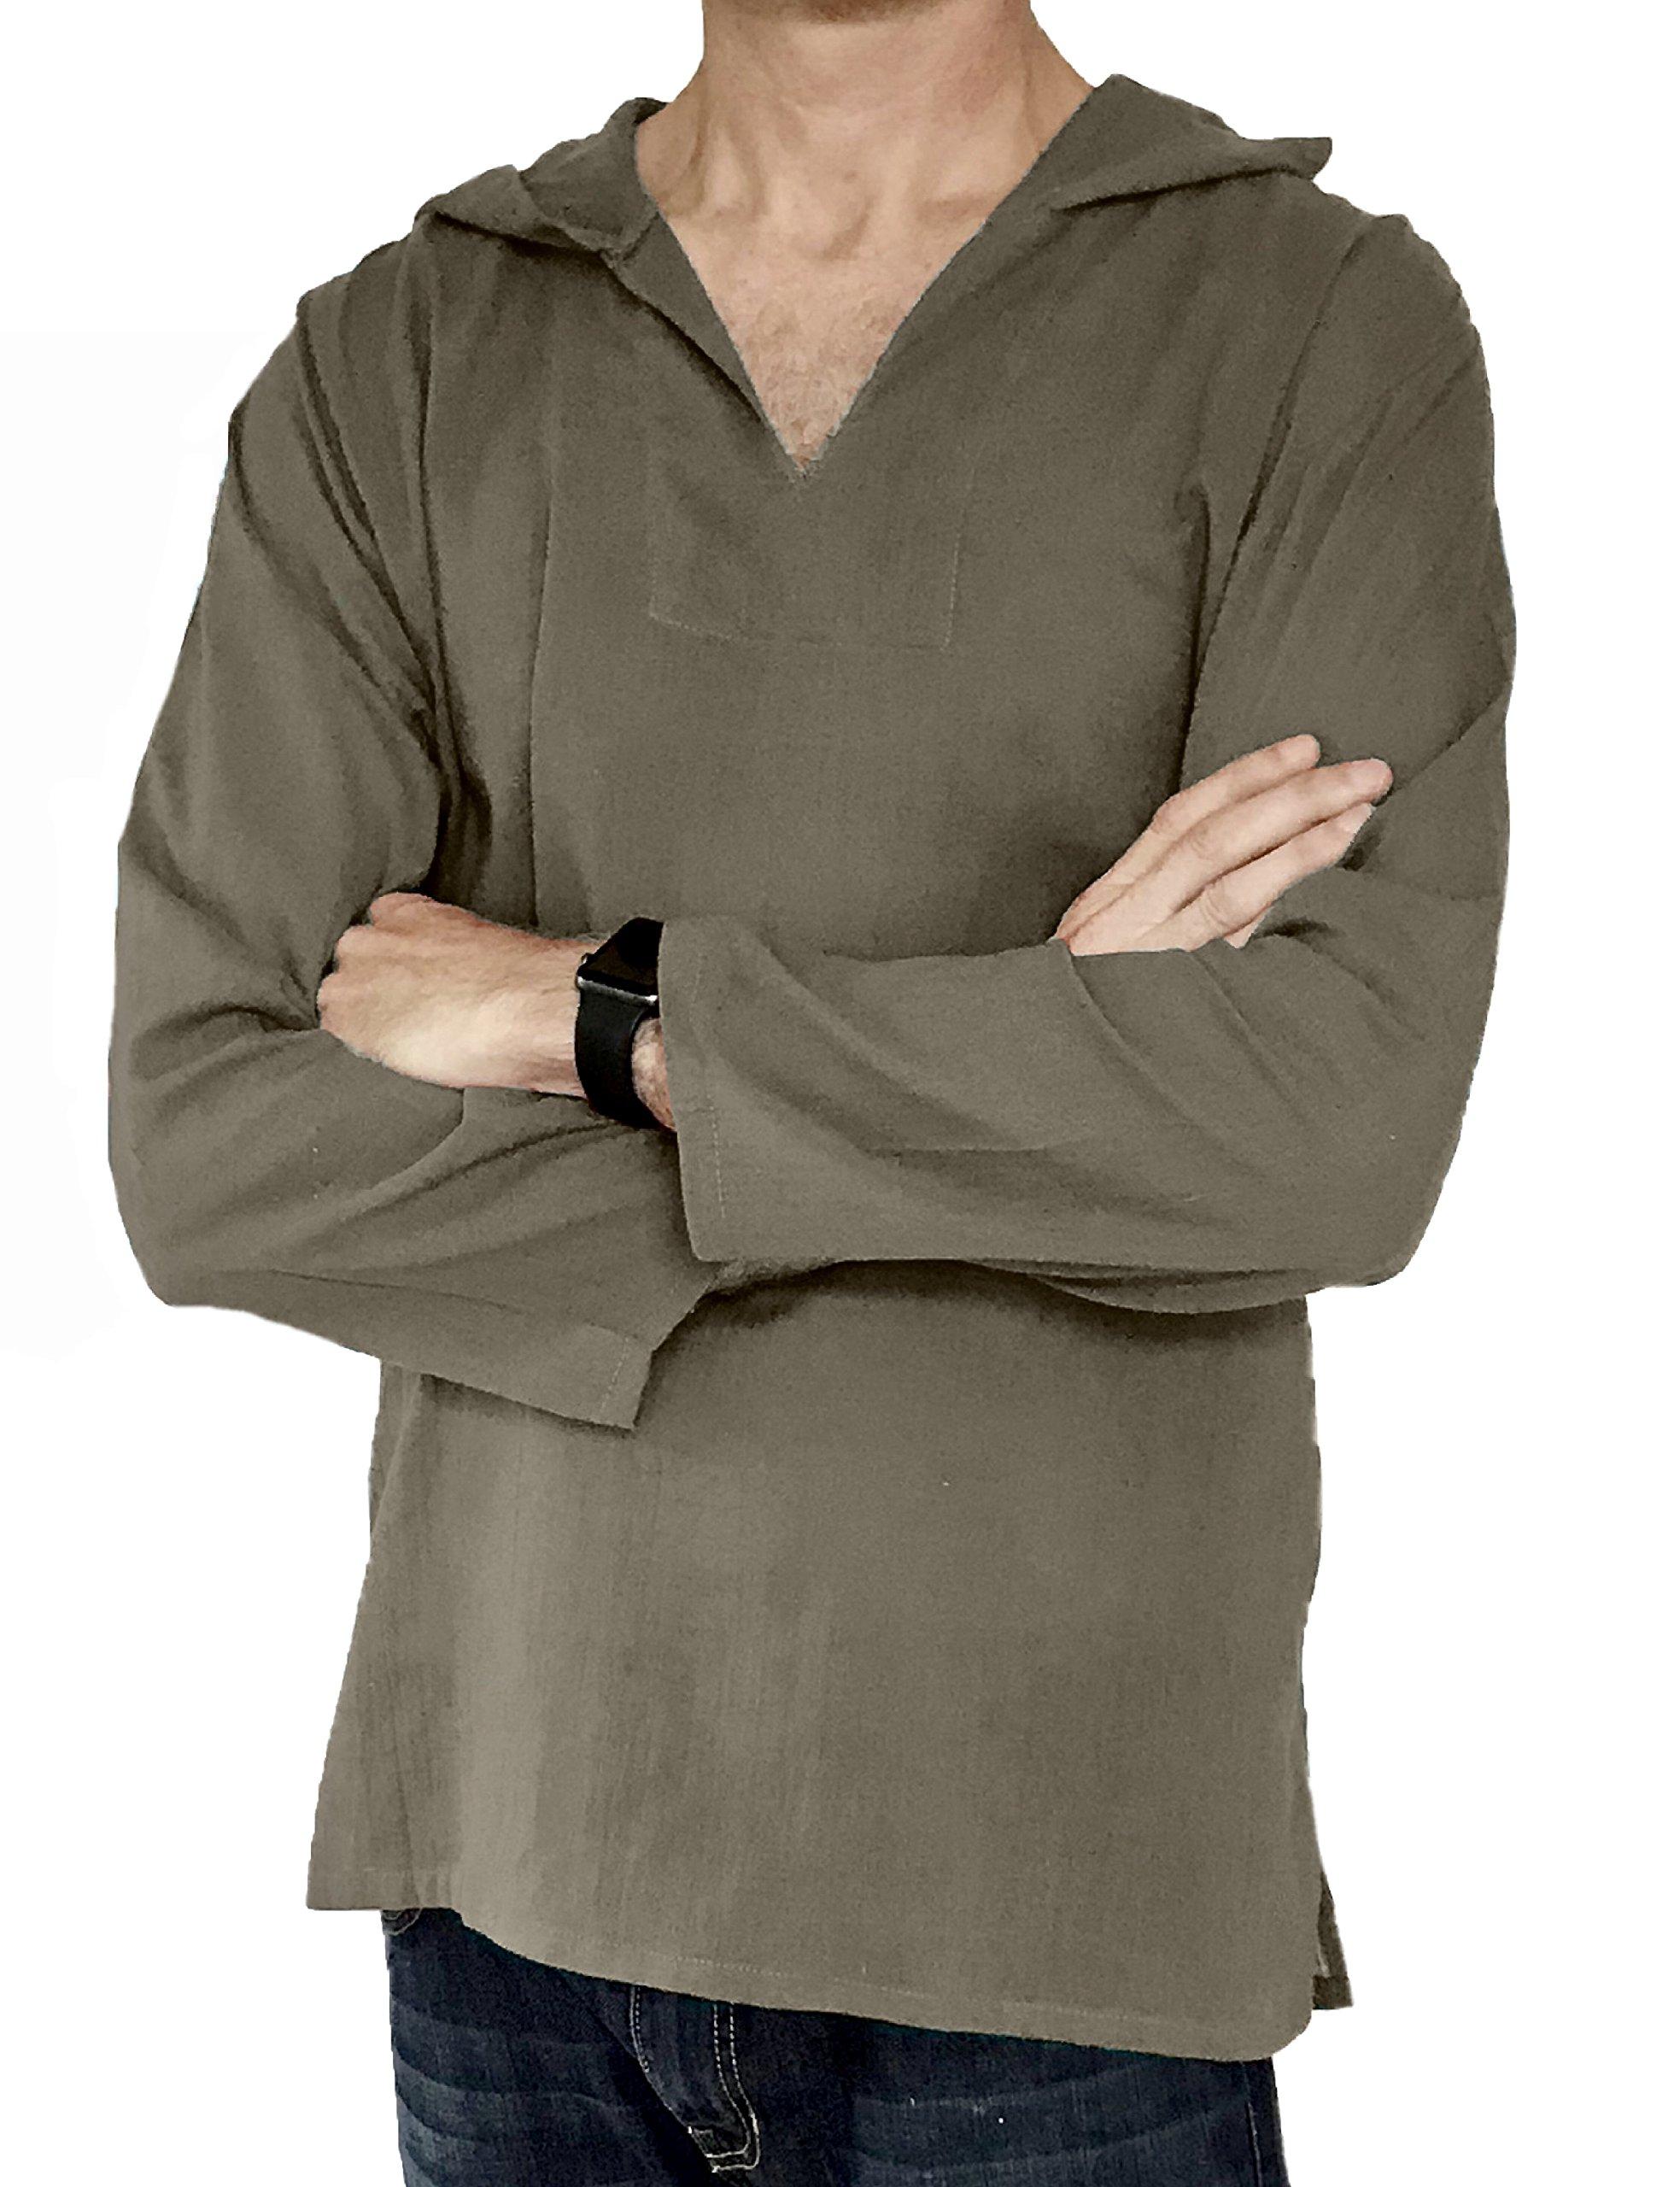 Love Quality Men's Hoodie Hippie Shirts Beach 100% Soft Cotton Top Yoga Shirt Boho (Large, Brown)